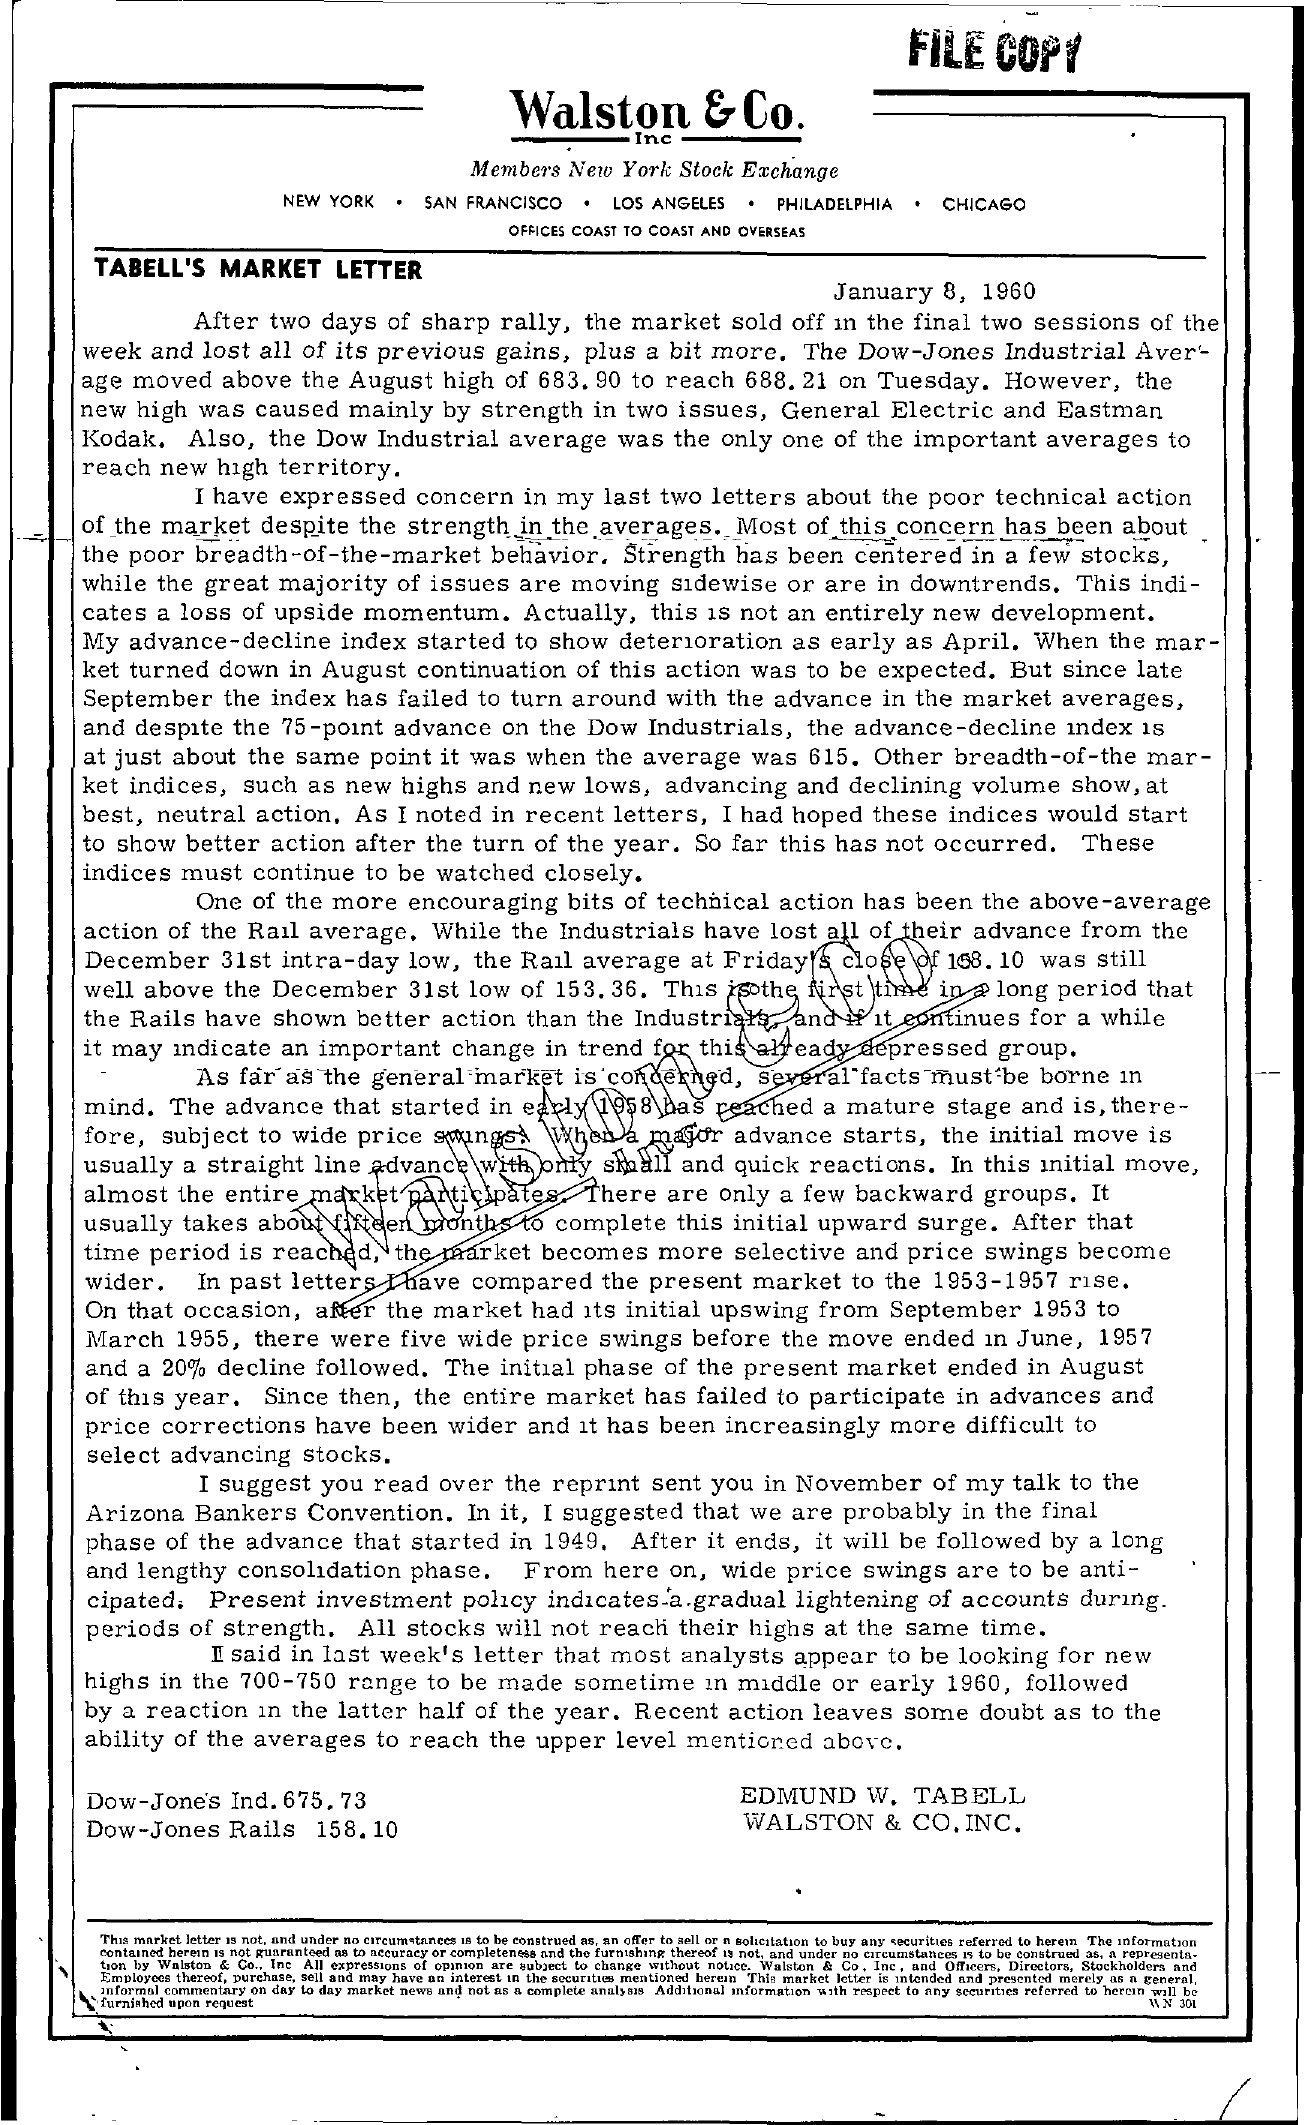 Tabell's Market Letter - January 08, 1960